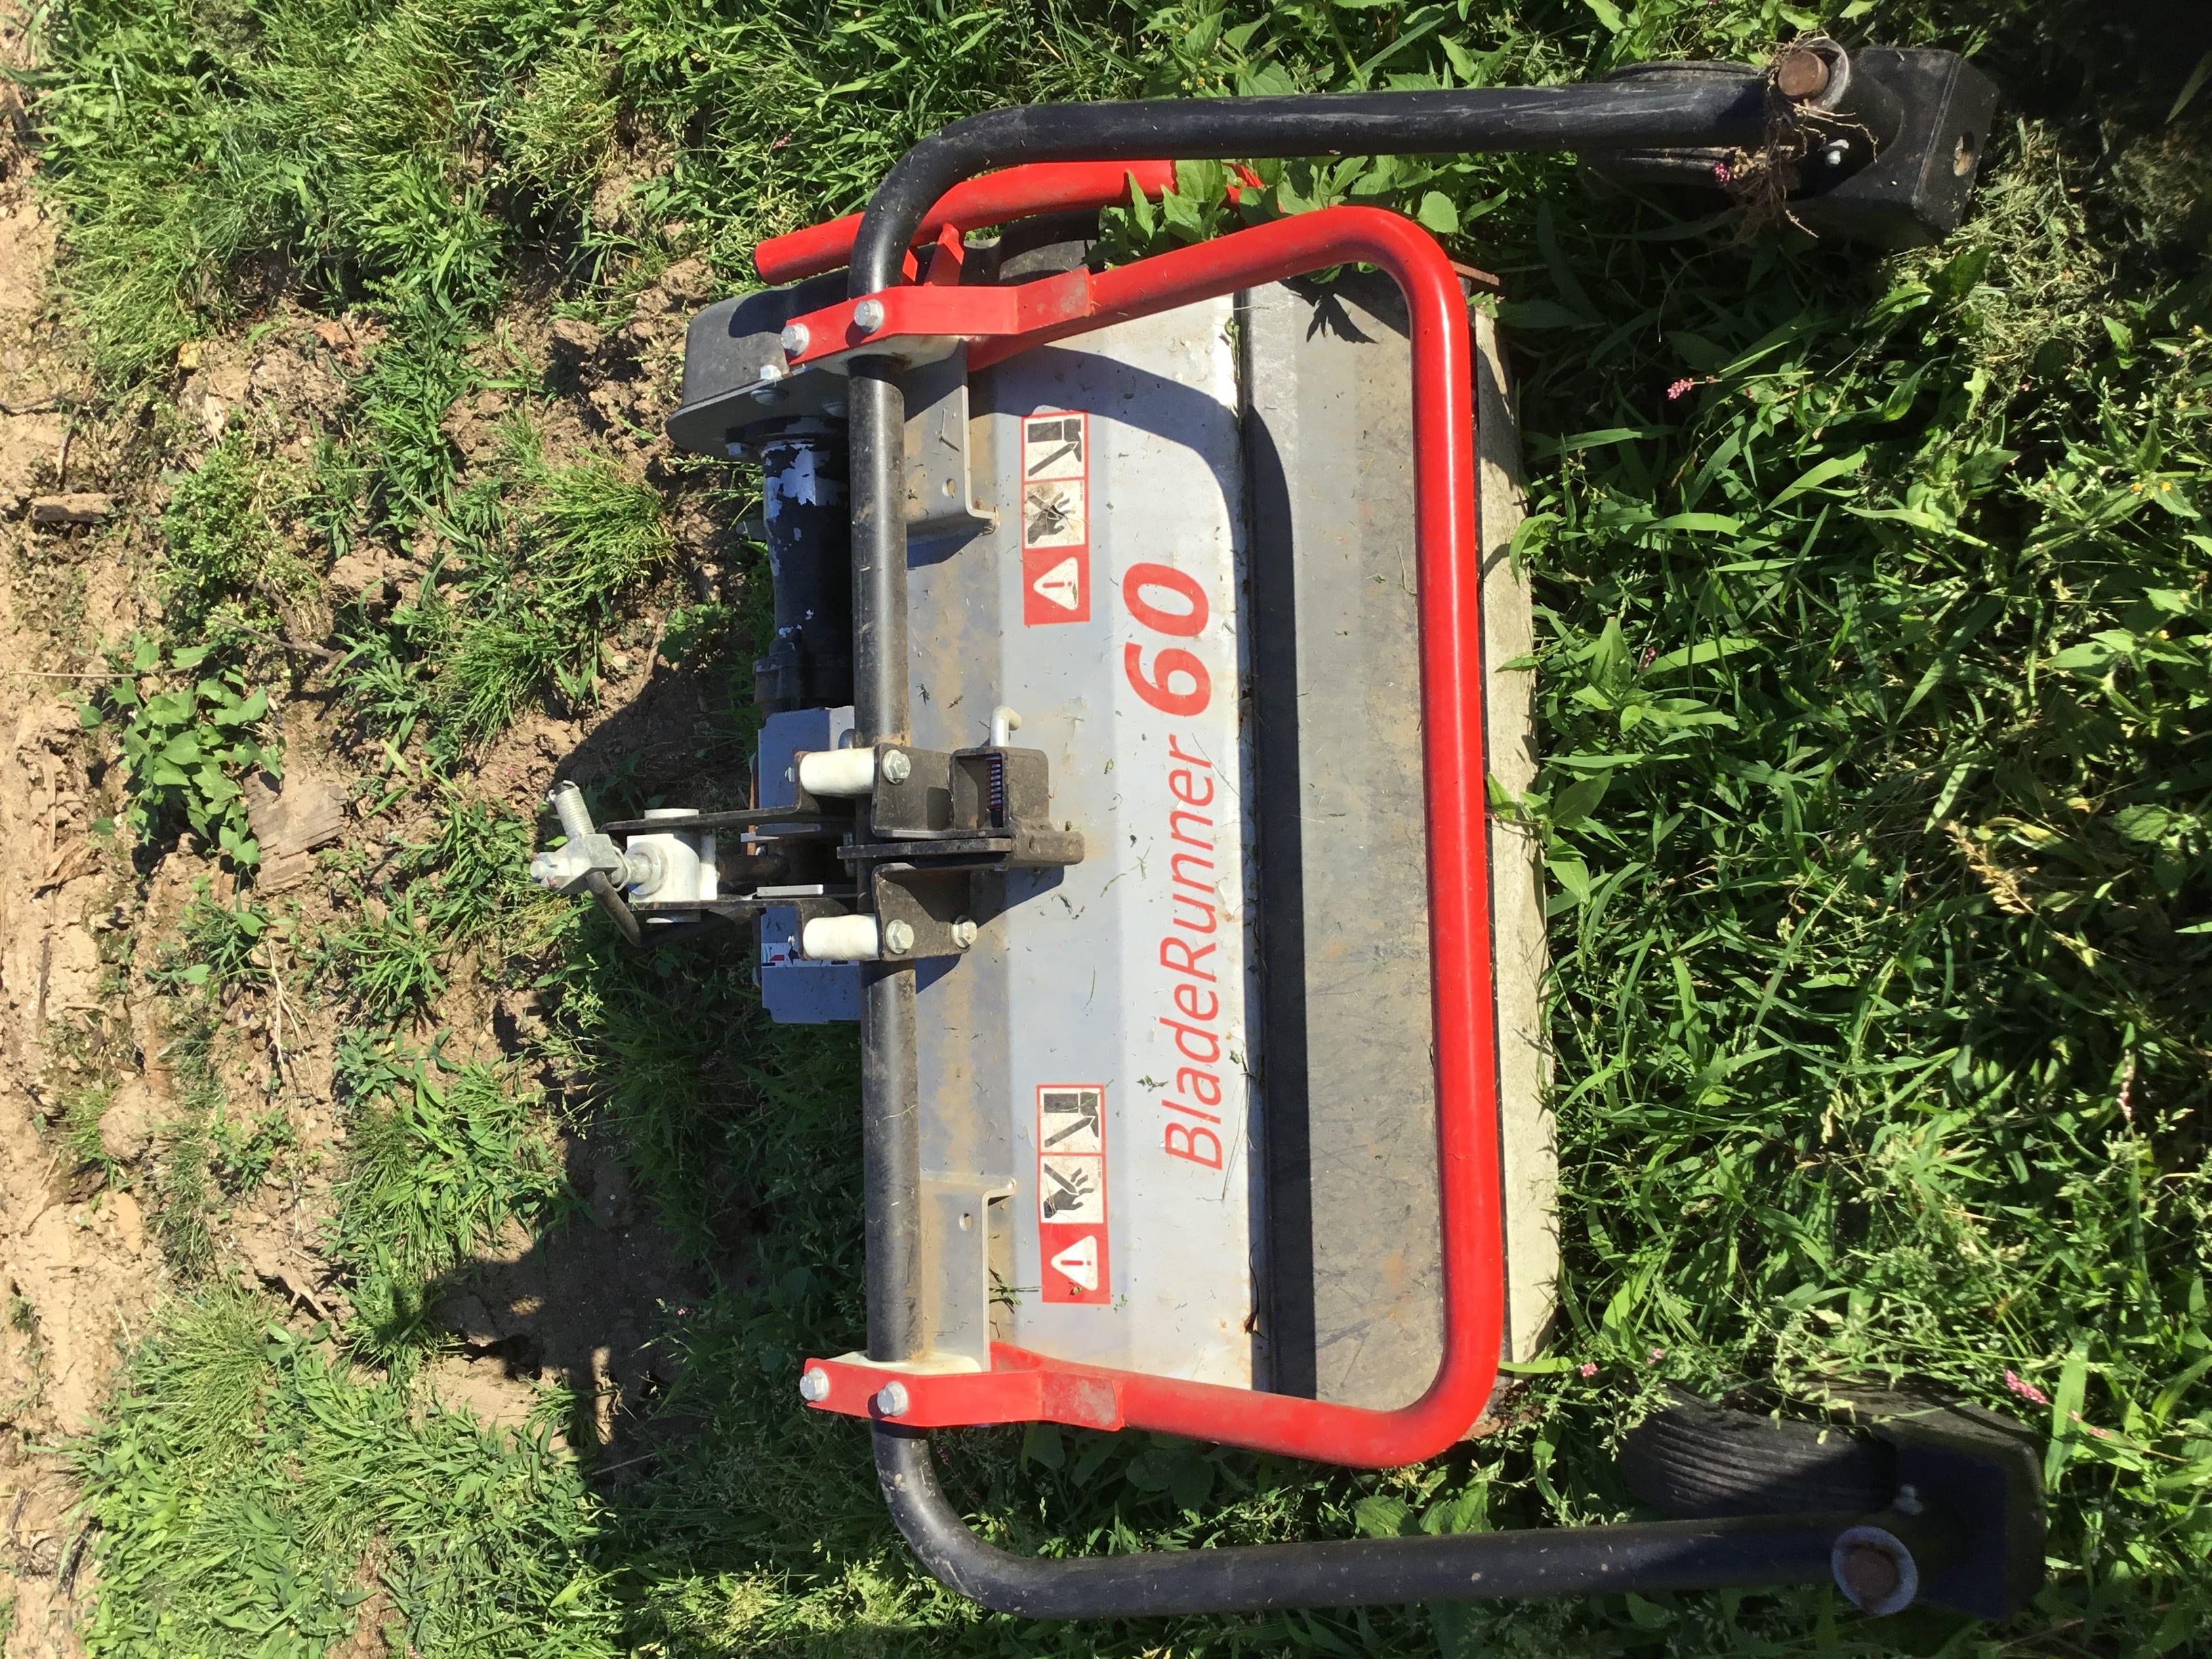 Bcs flail mower | Pennsylvania Association for Sustainable